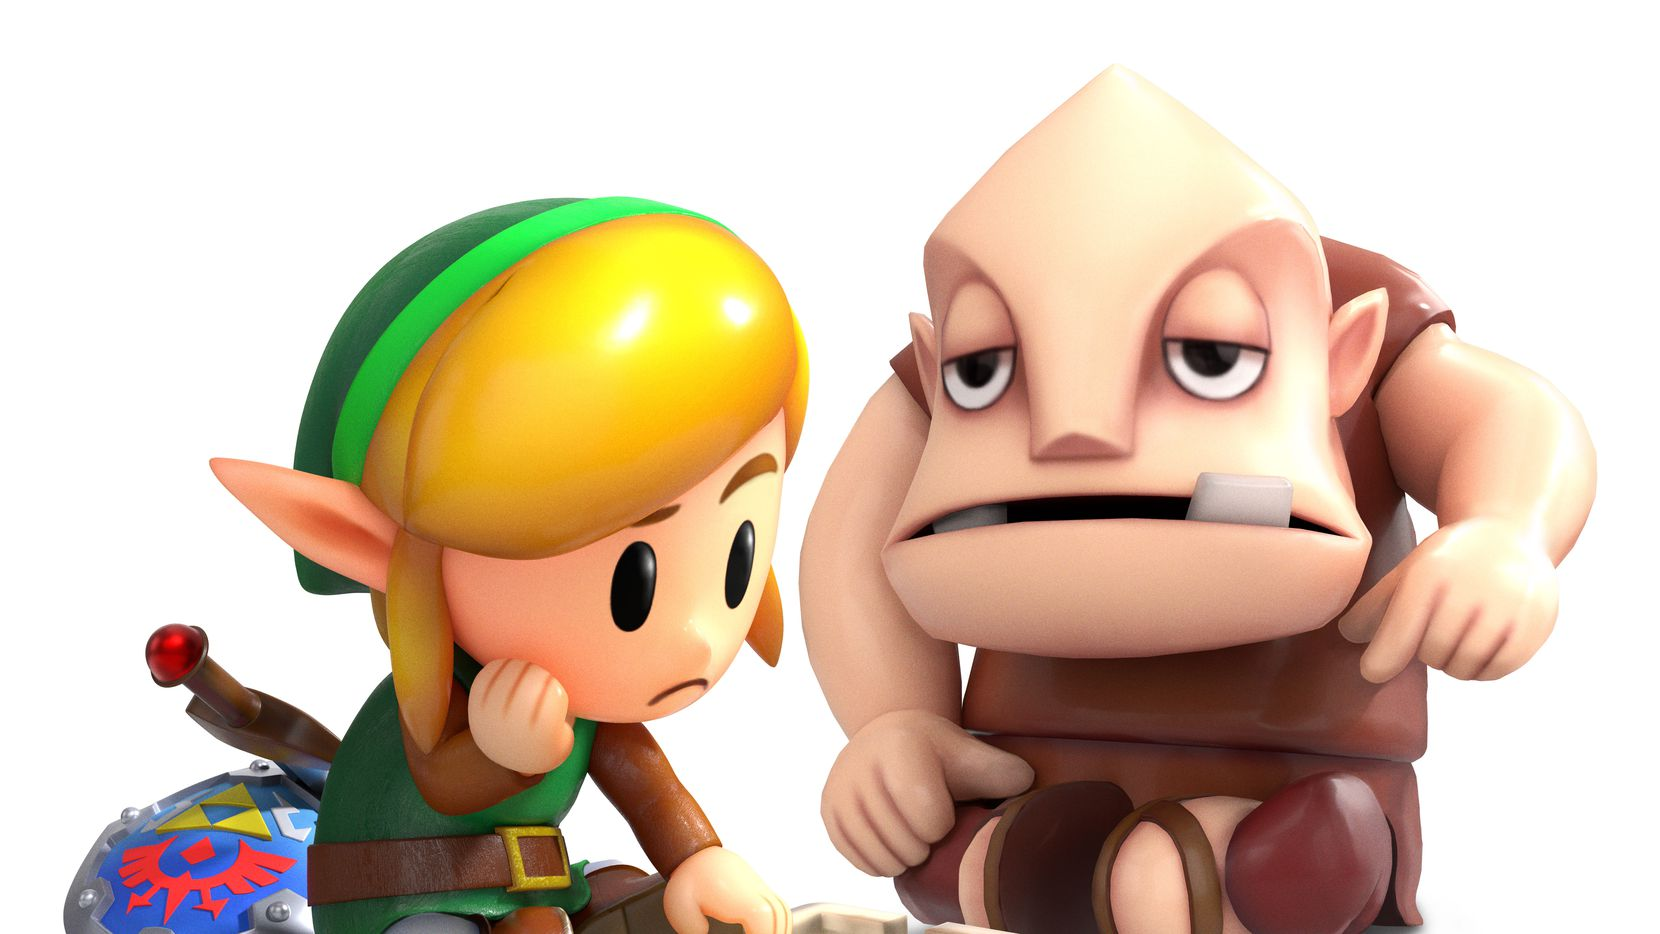 Artwork from The Legend of Zelda: Link's Awakening on the Nintendo Switch.